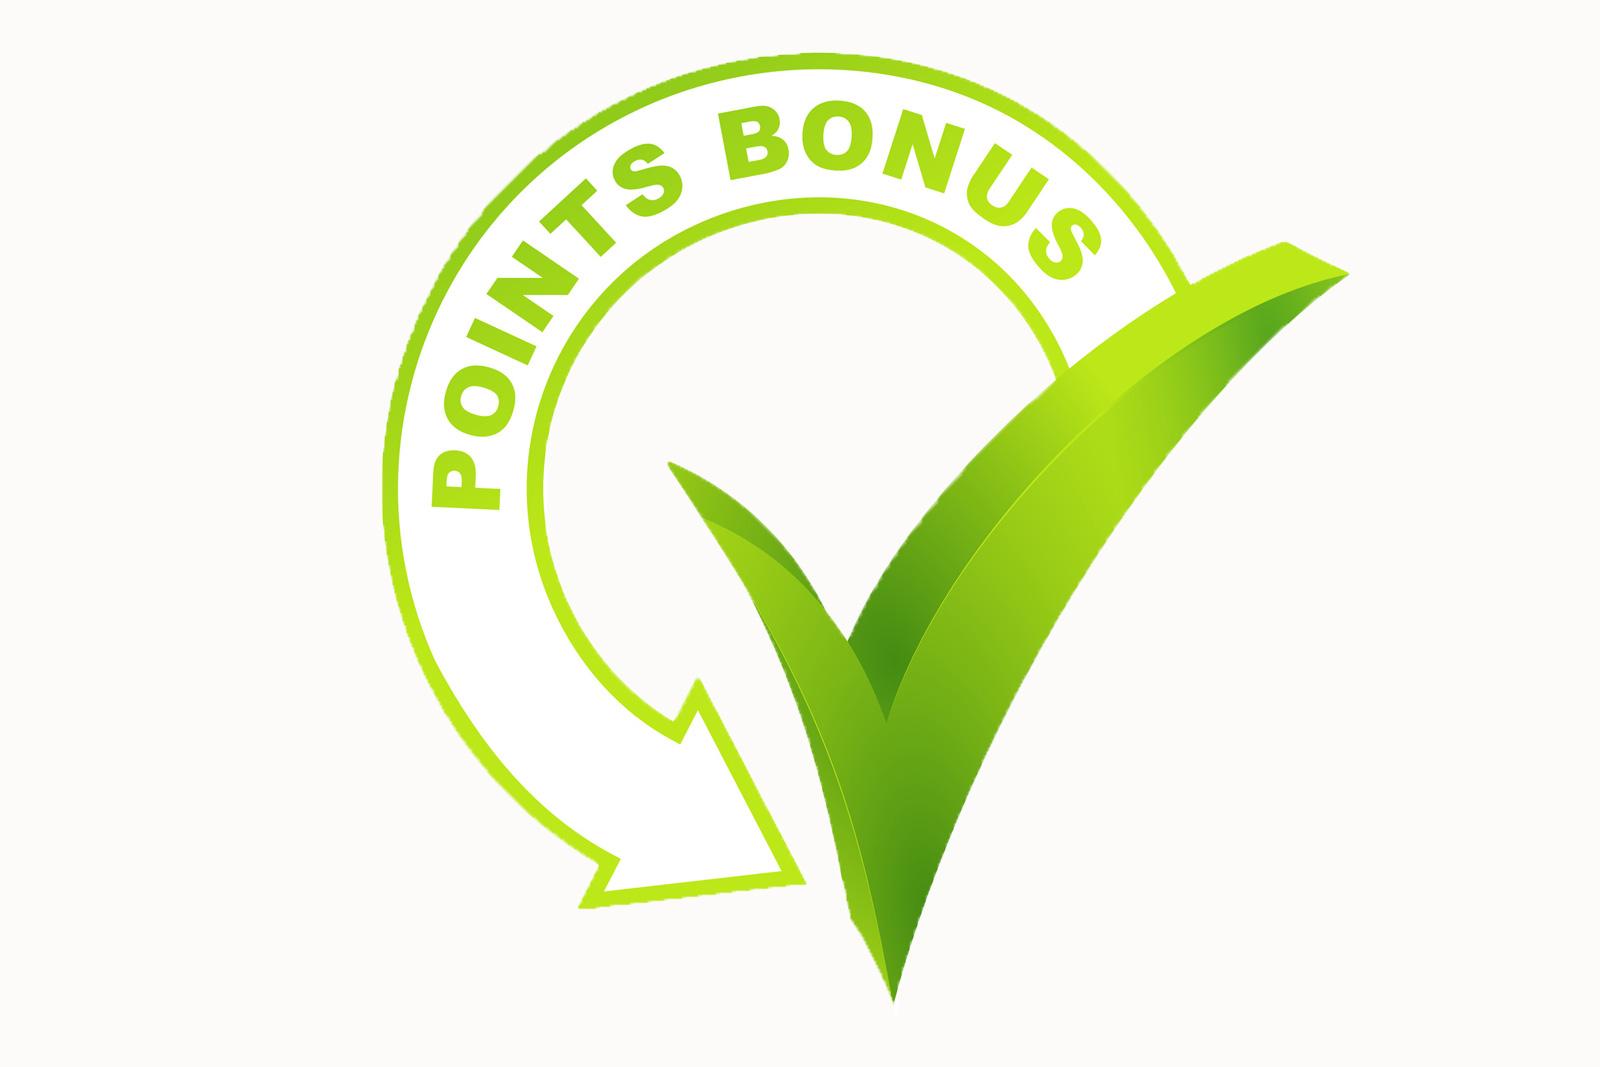 bonuspunkte